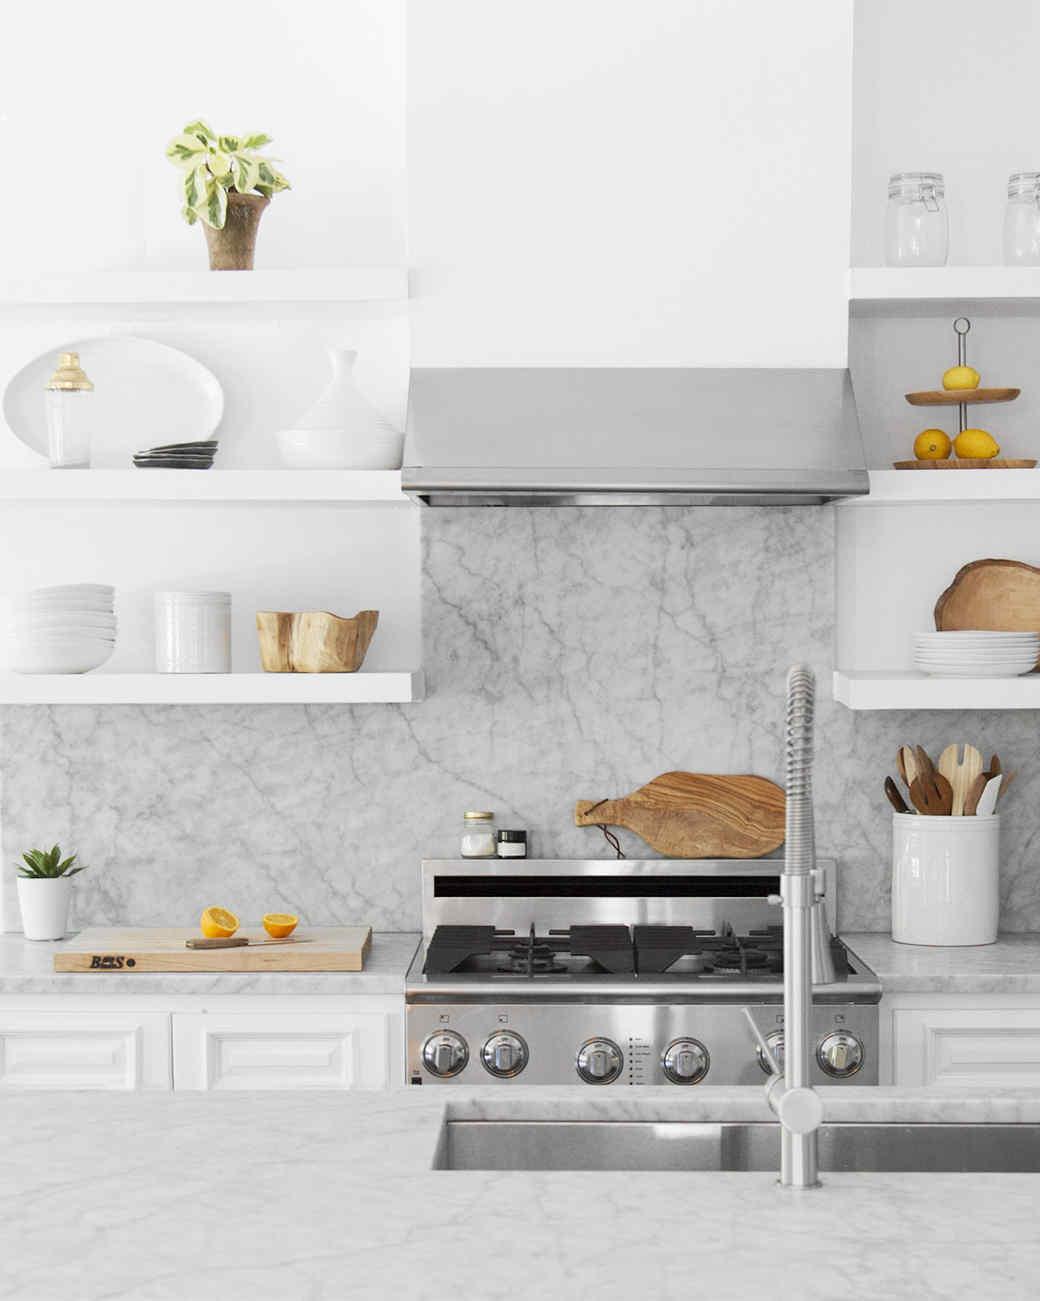 Kitchen-Backsplash-Marble-1215.jpg (skyword:207431)